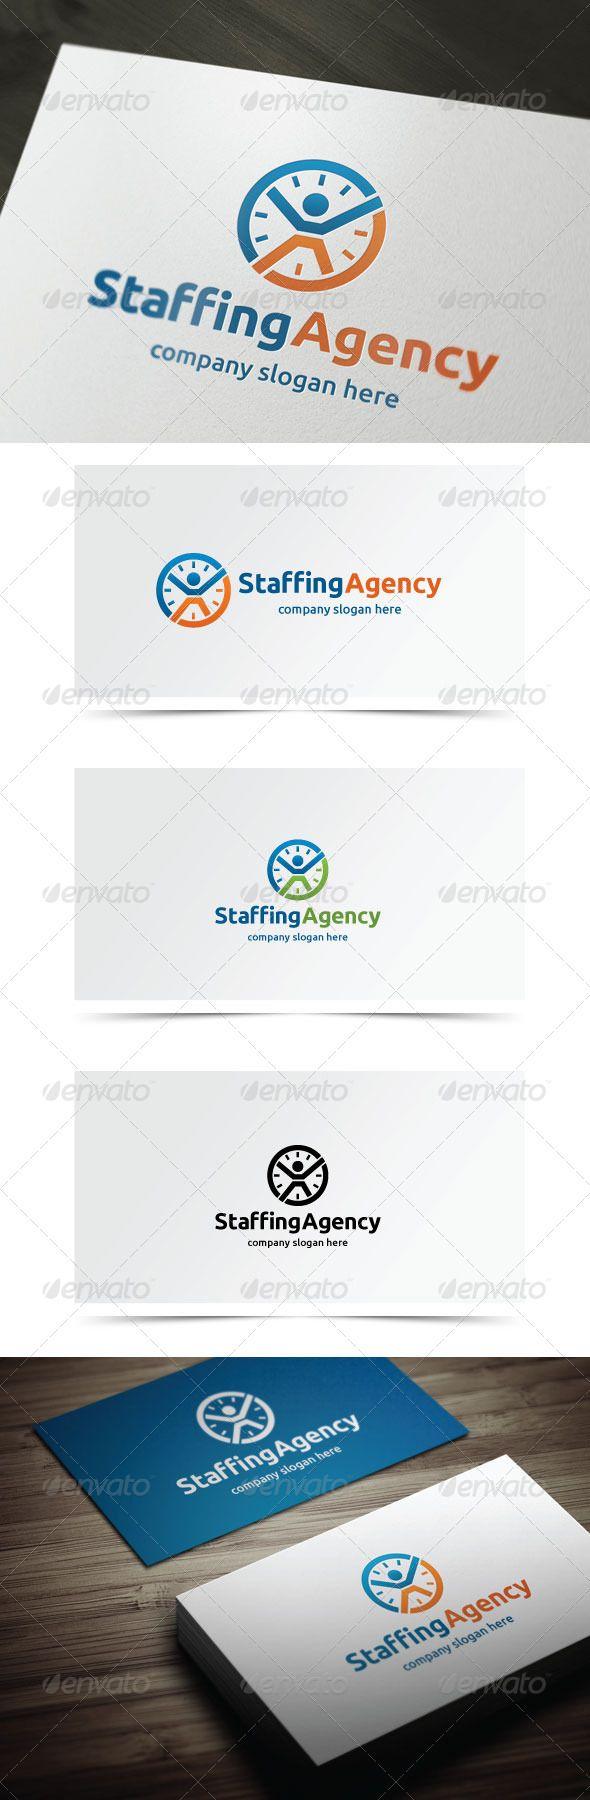 54 best Logo Templates images on Pinterest | Logo templates, Font ...